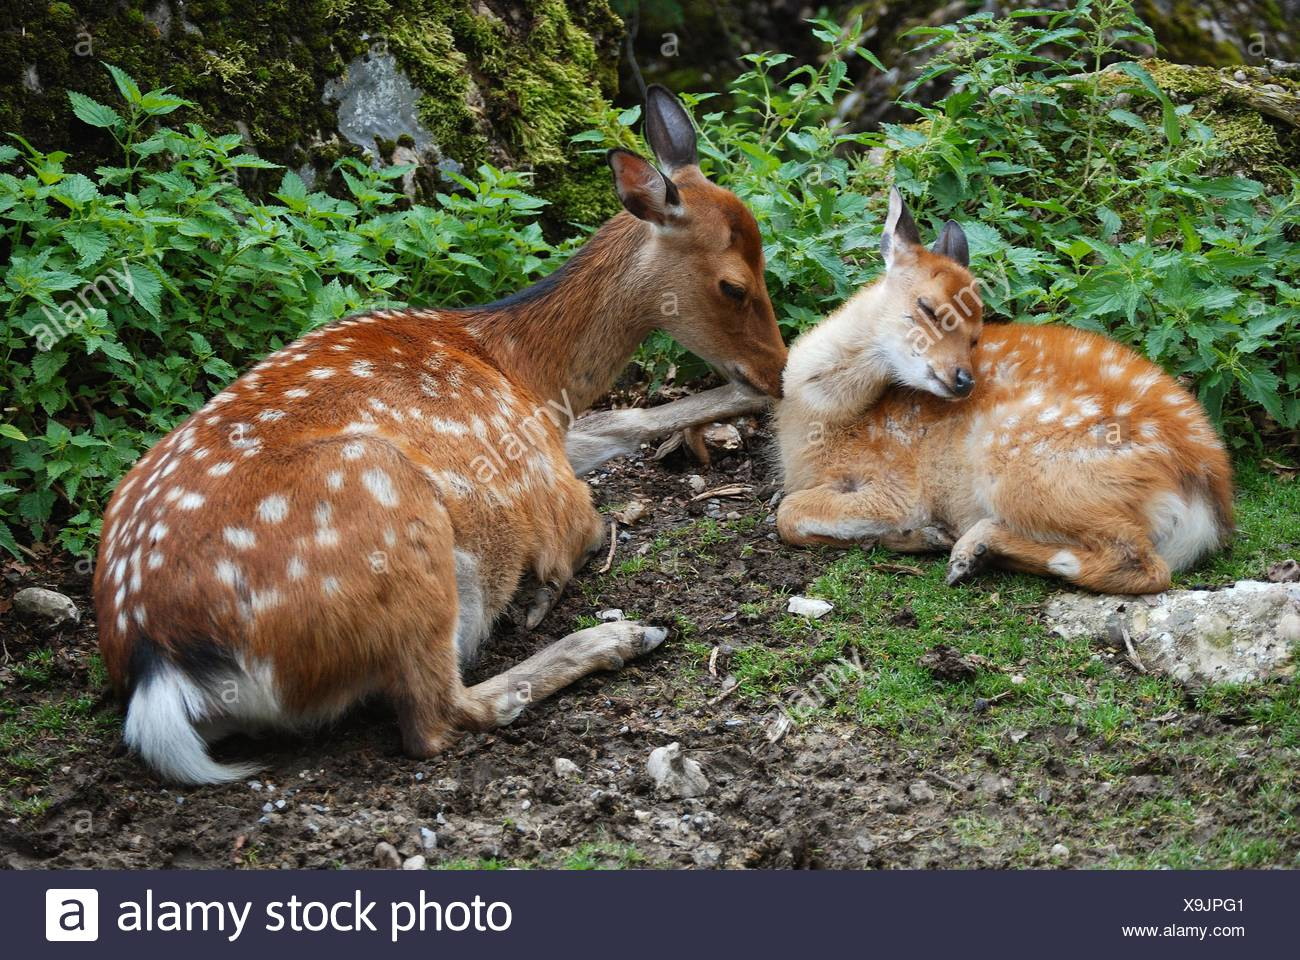 mammals - Stock Image